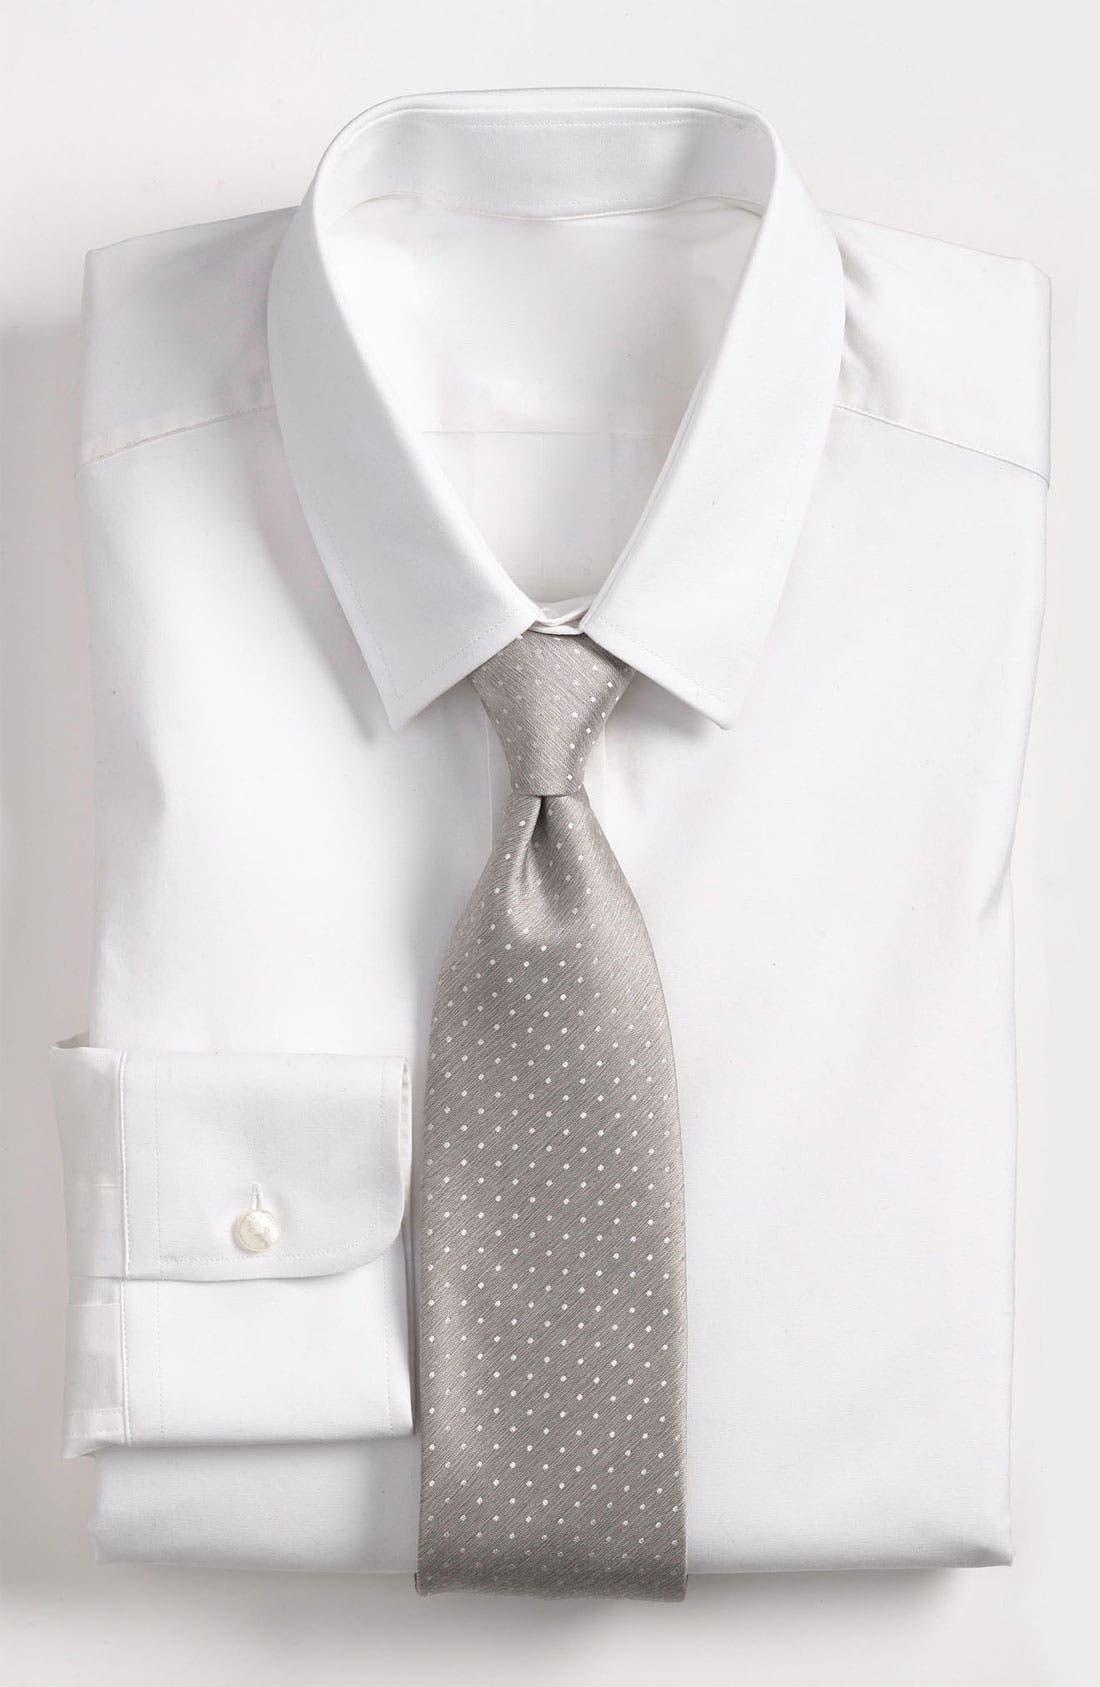 Main Image - Yves Saint Laurent Textured Dot Pattern Woven Silk Tie